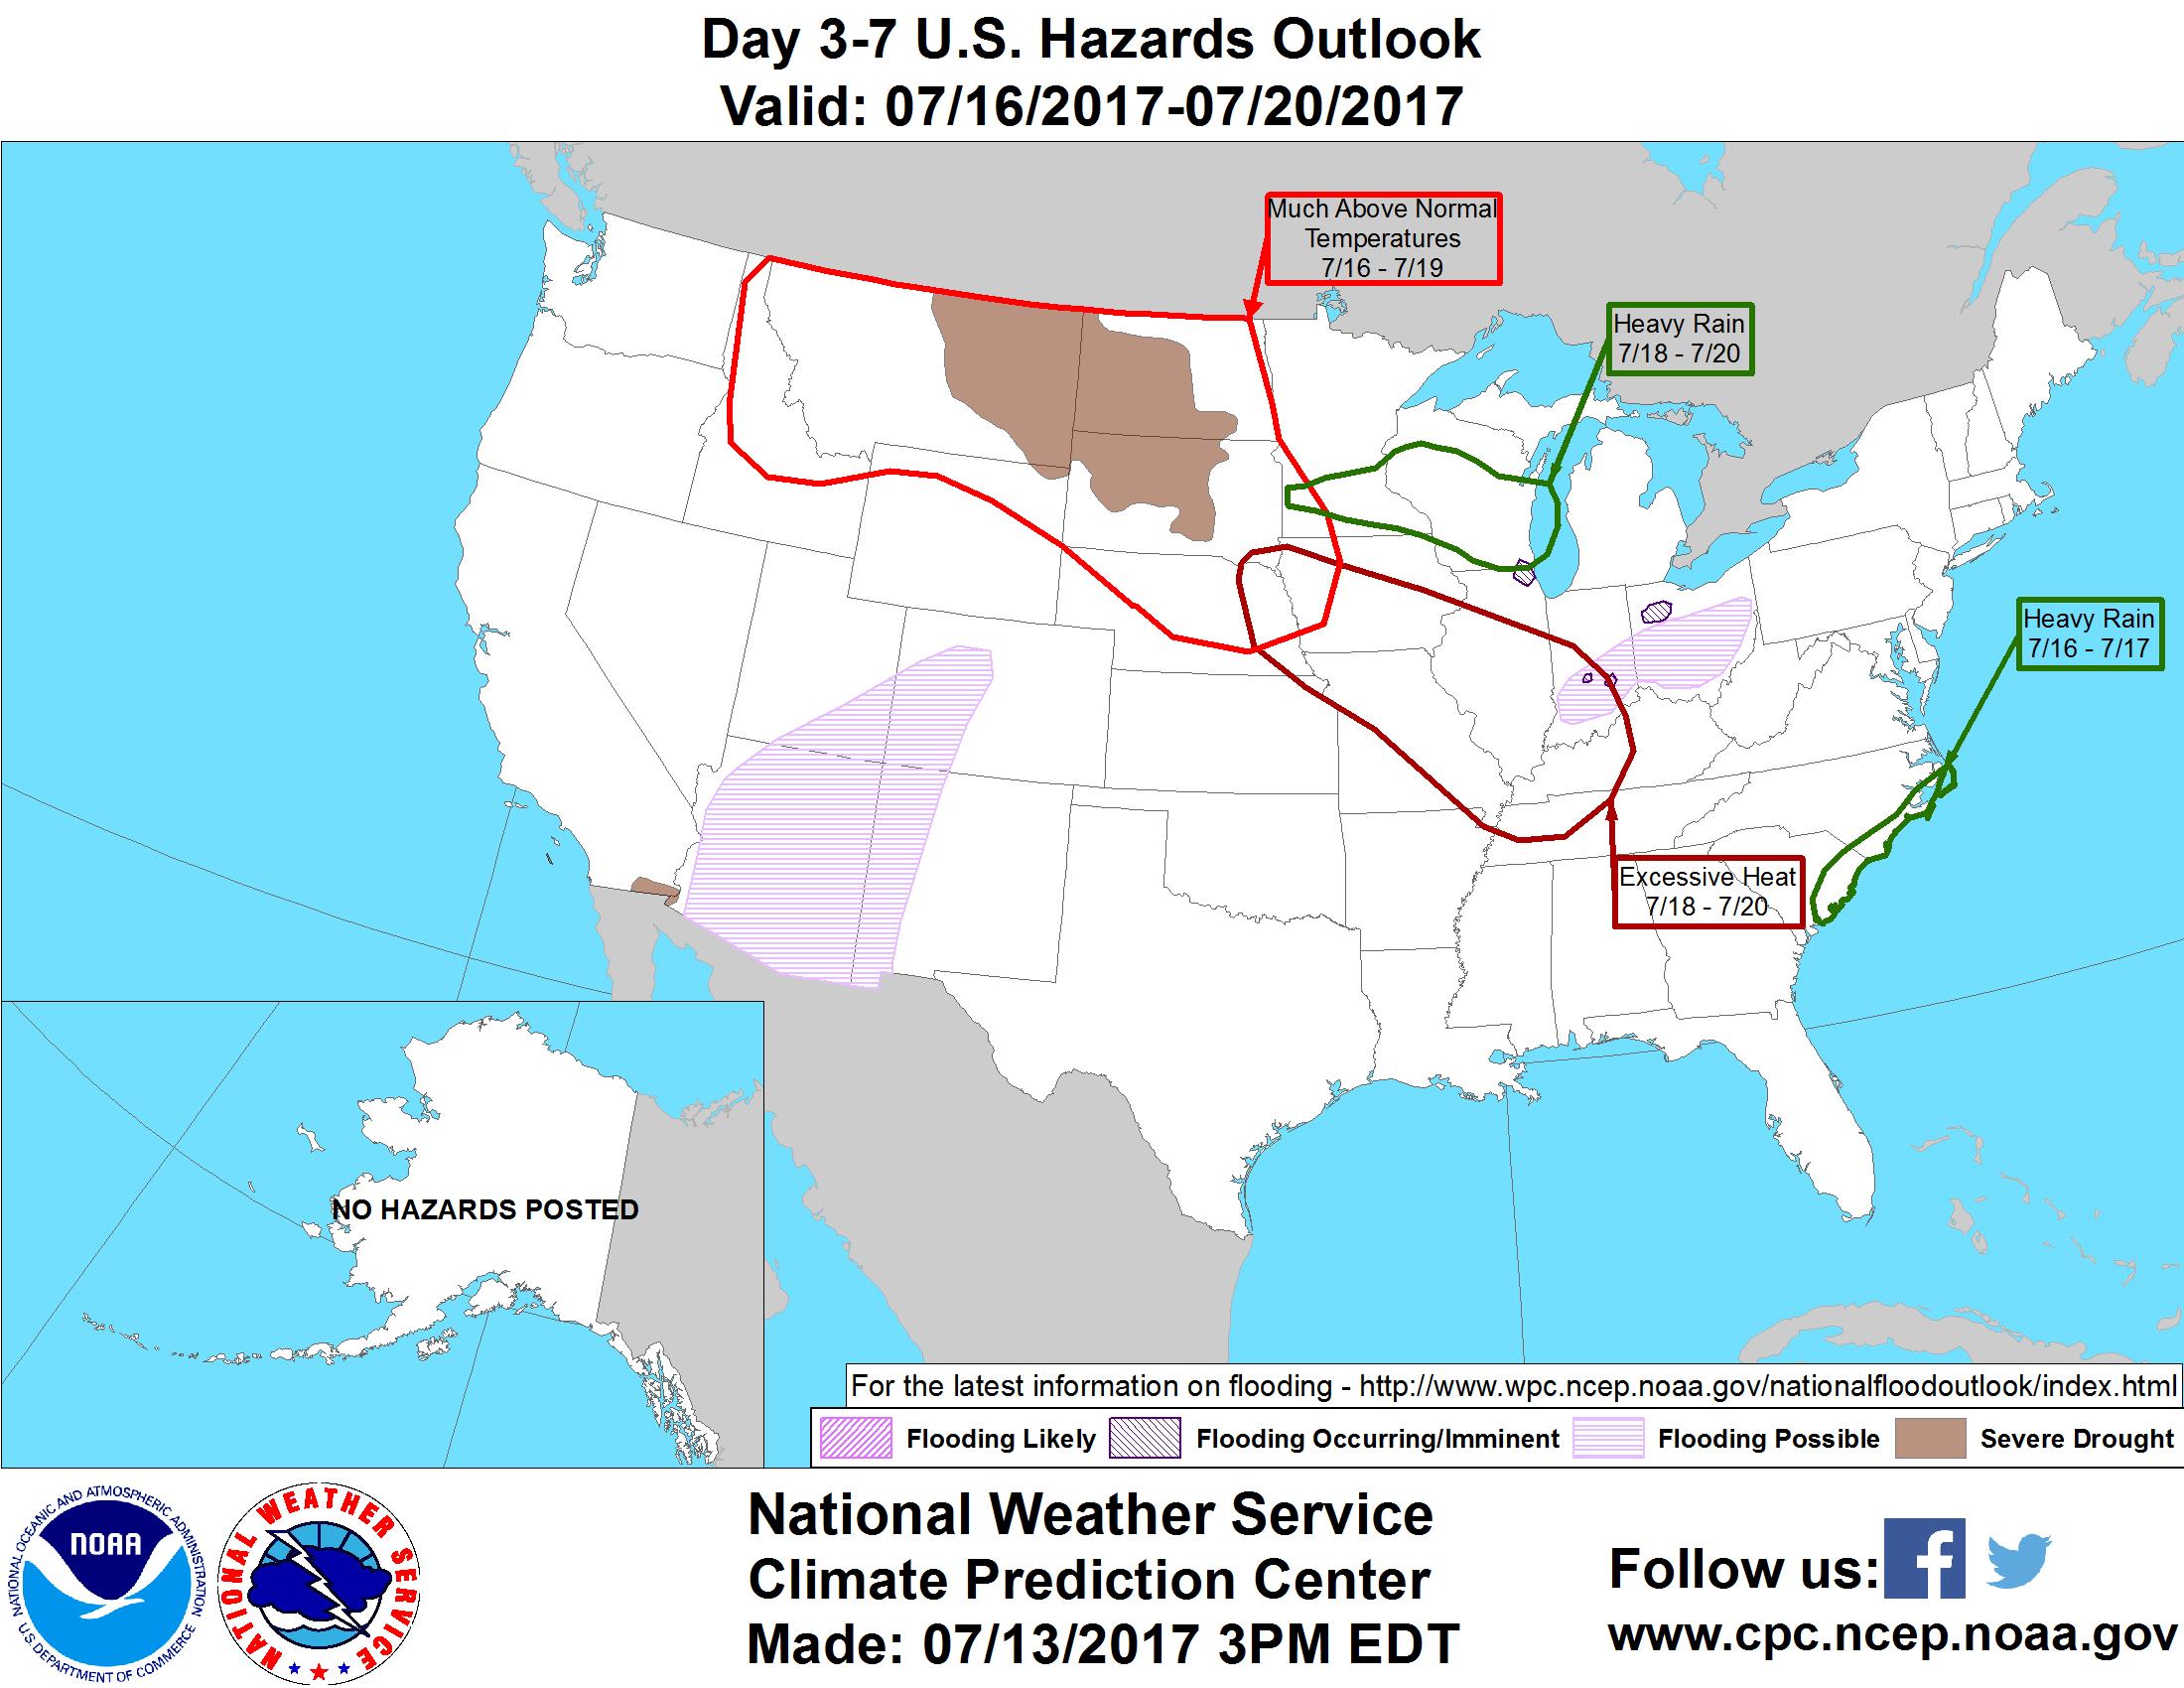 Nearly Perfect Sunday Heavy Rain Chances Ahead StarTribunecom - Map of the us hazards comic